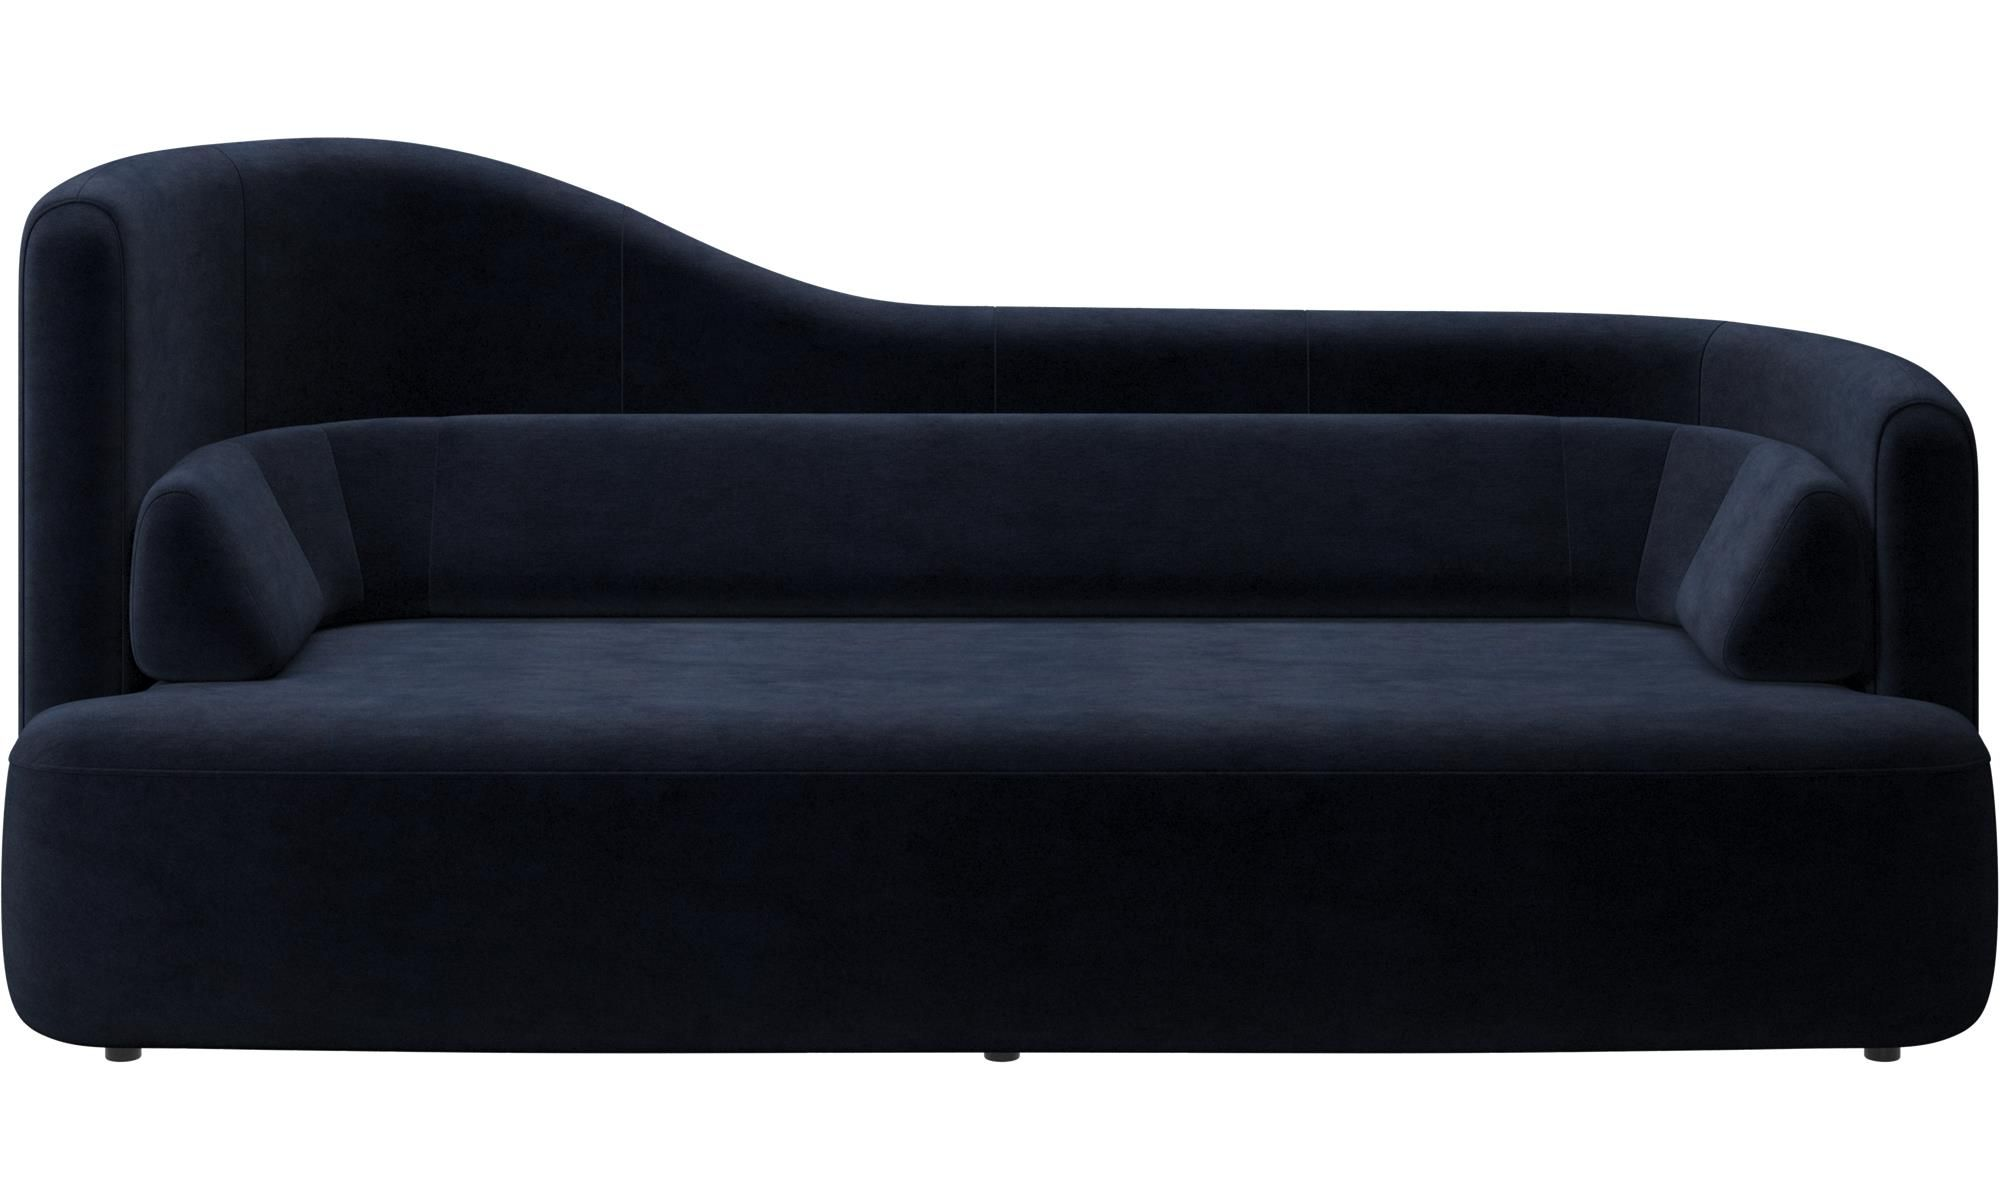 Ottawa Sofa 5 Seater Sofa Seater Sofa Sofa